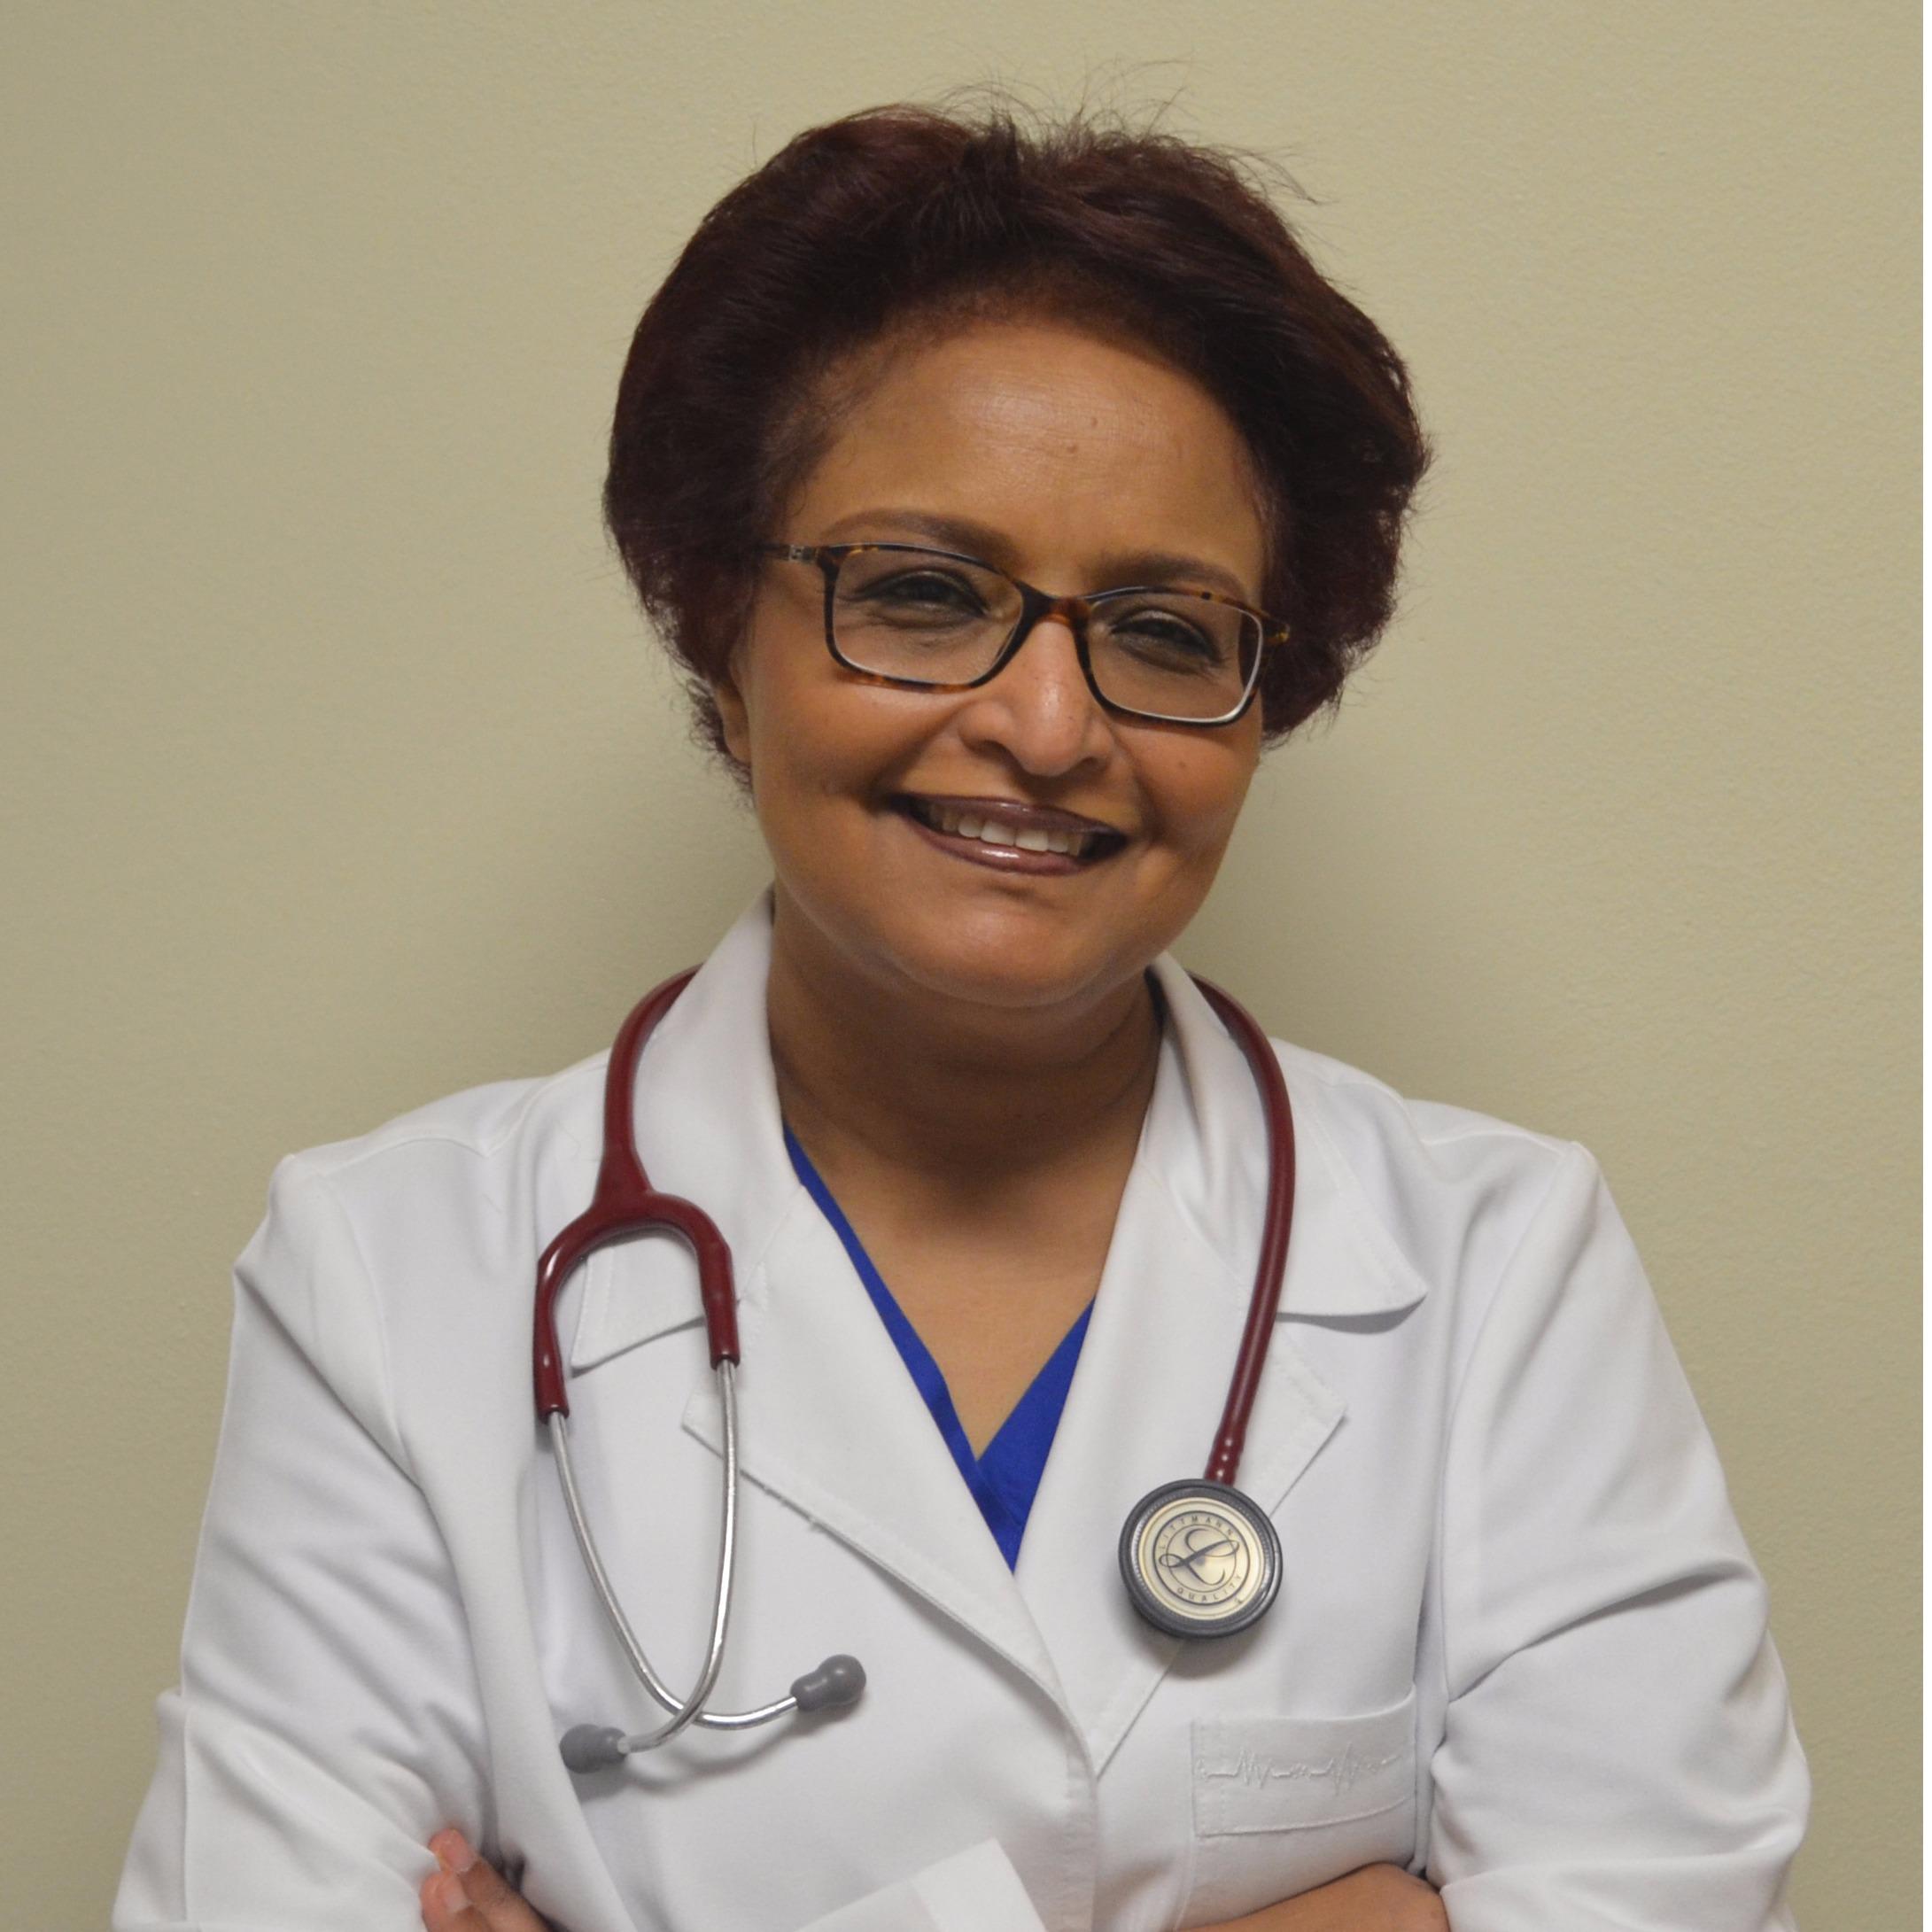 Dr. Eiman A Elsayed MD